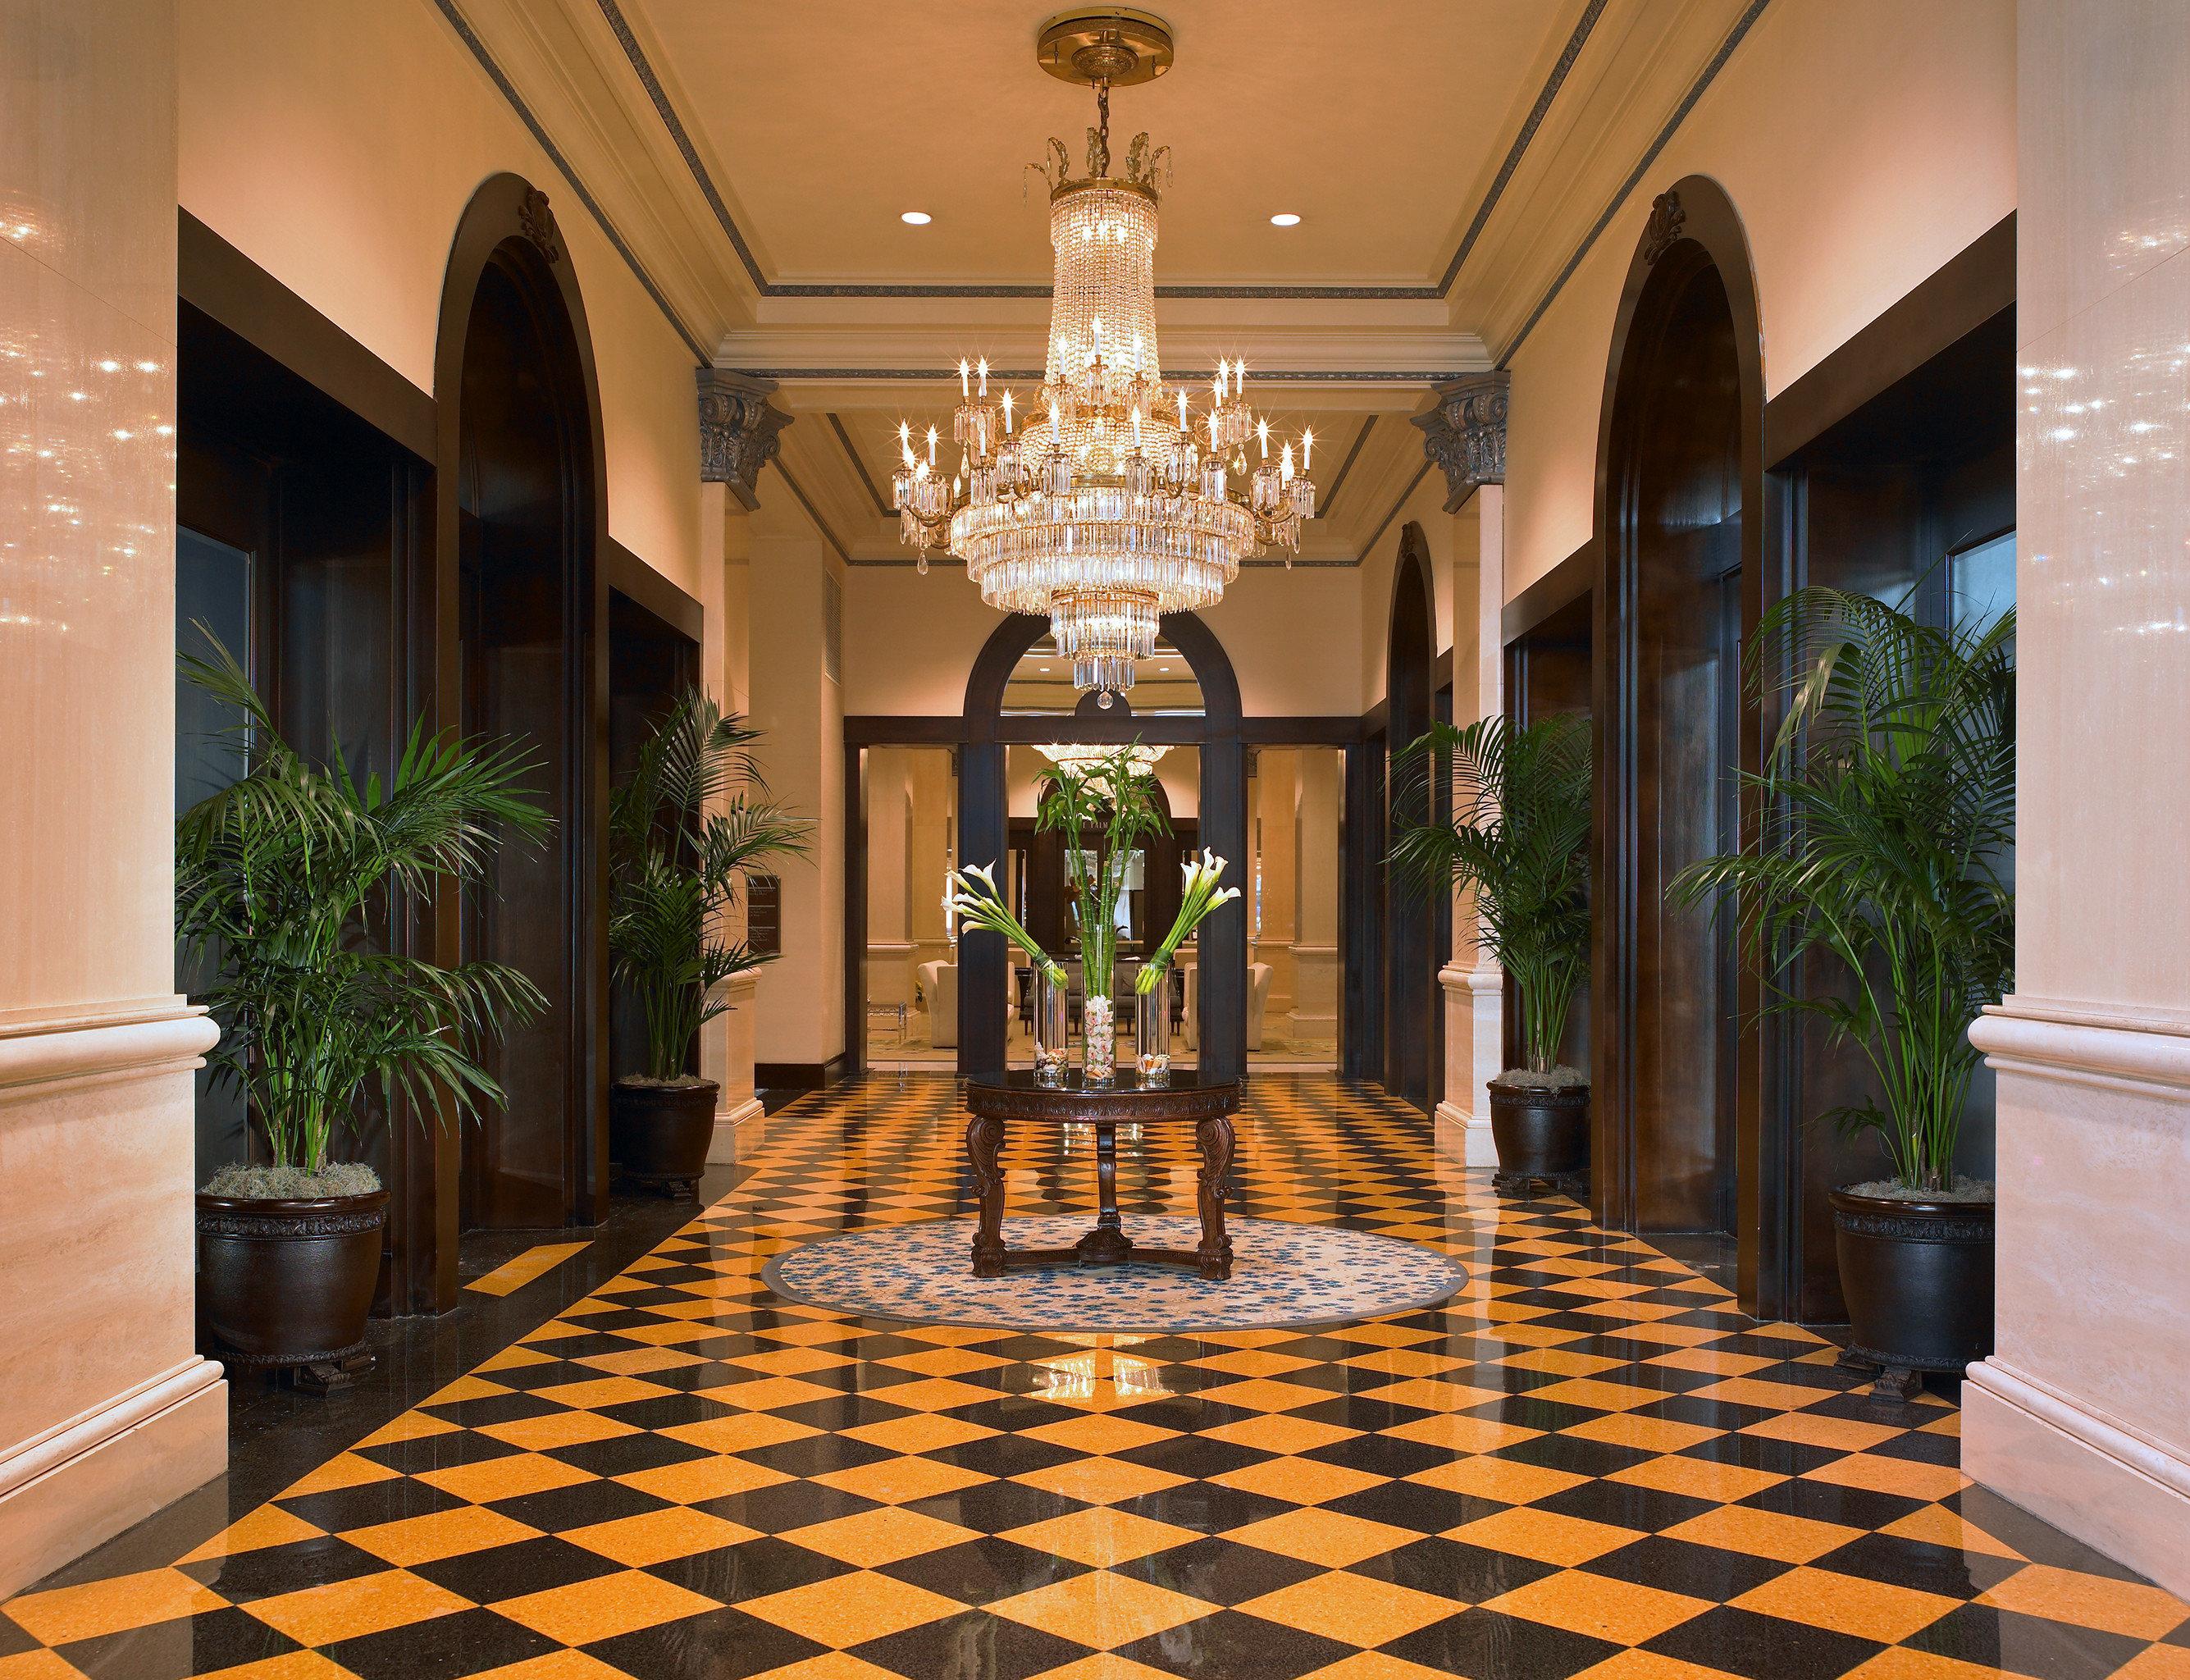 Elegant Hotels Lobby Lounge floor property estate room building mansion interior design palace home flooring hall living room condominium ballroom Resort decorated